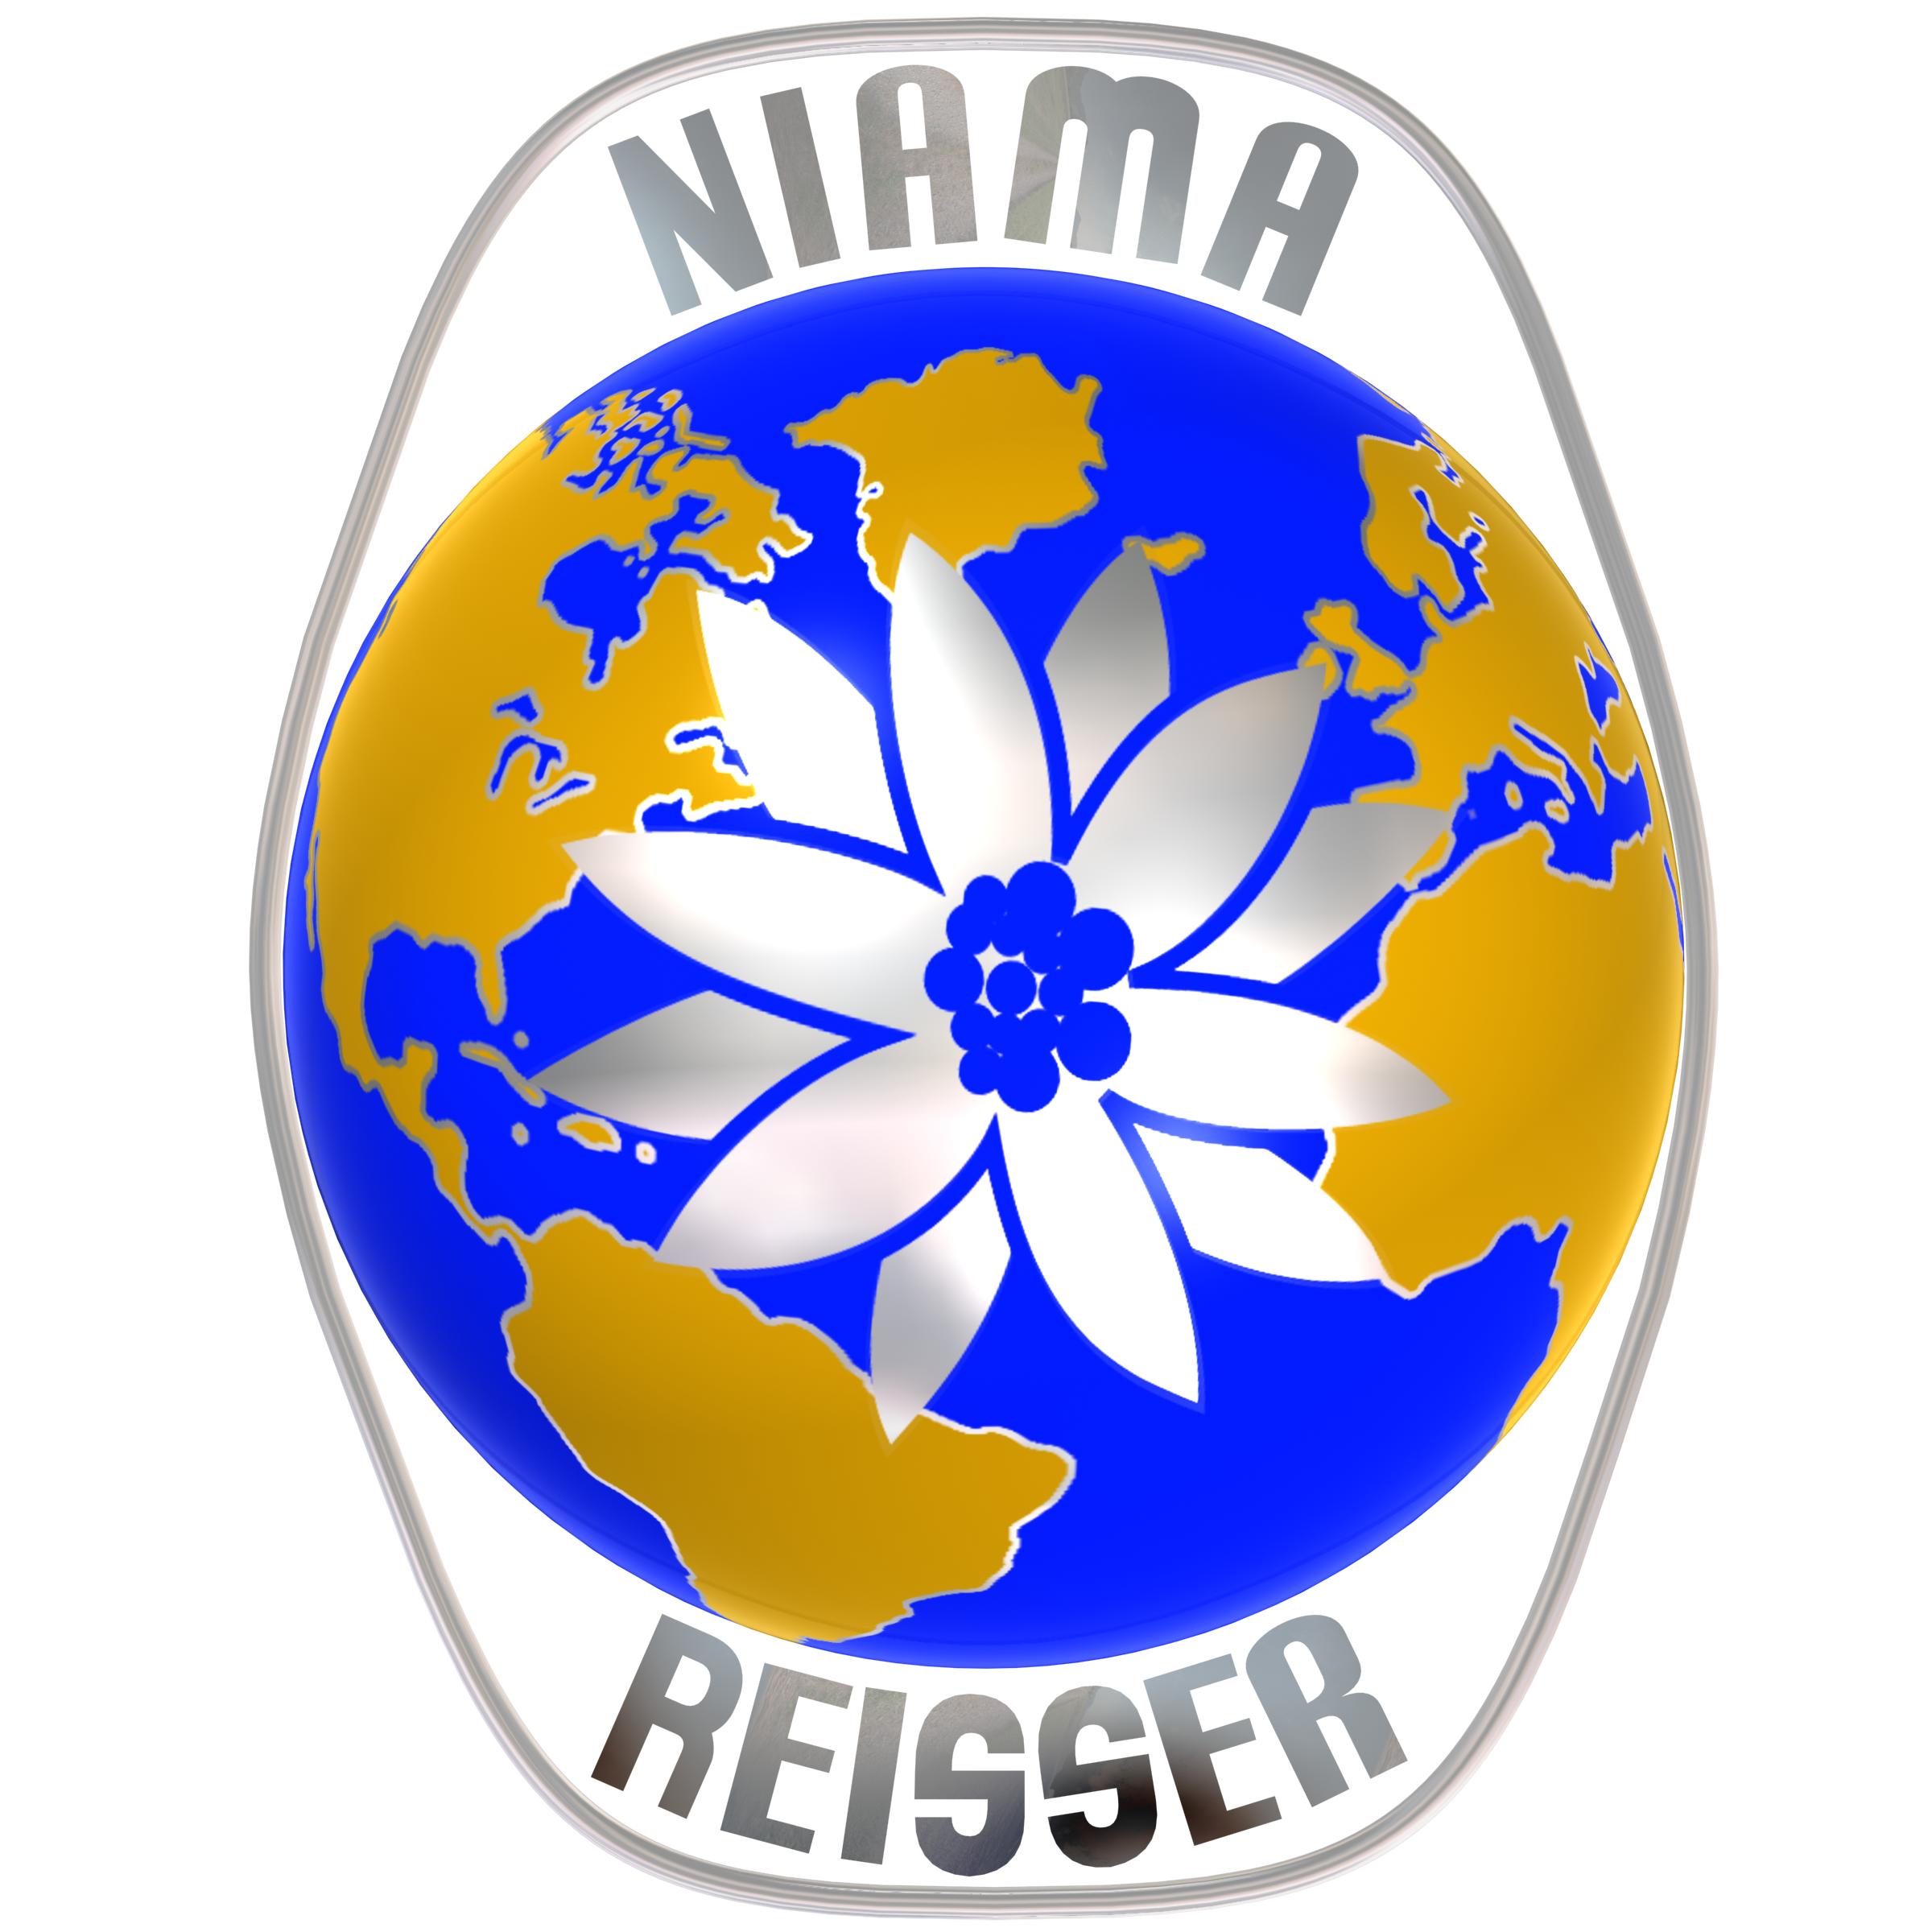 Niama-Reisser, LLC